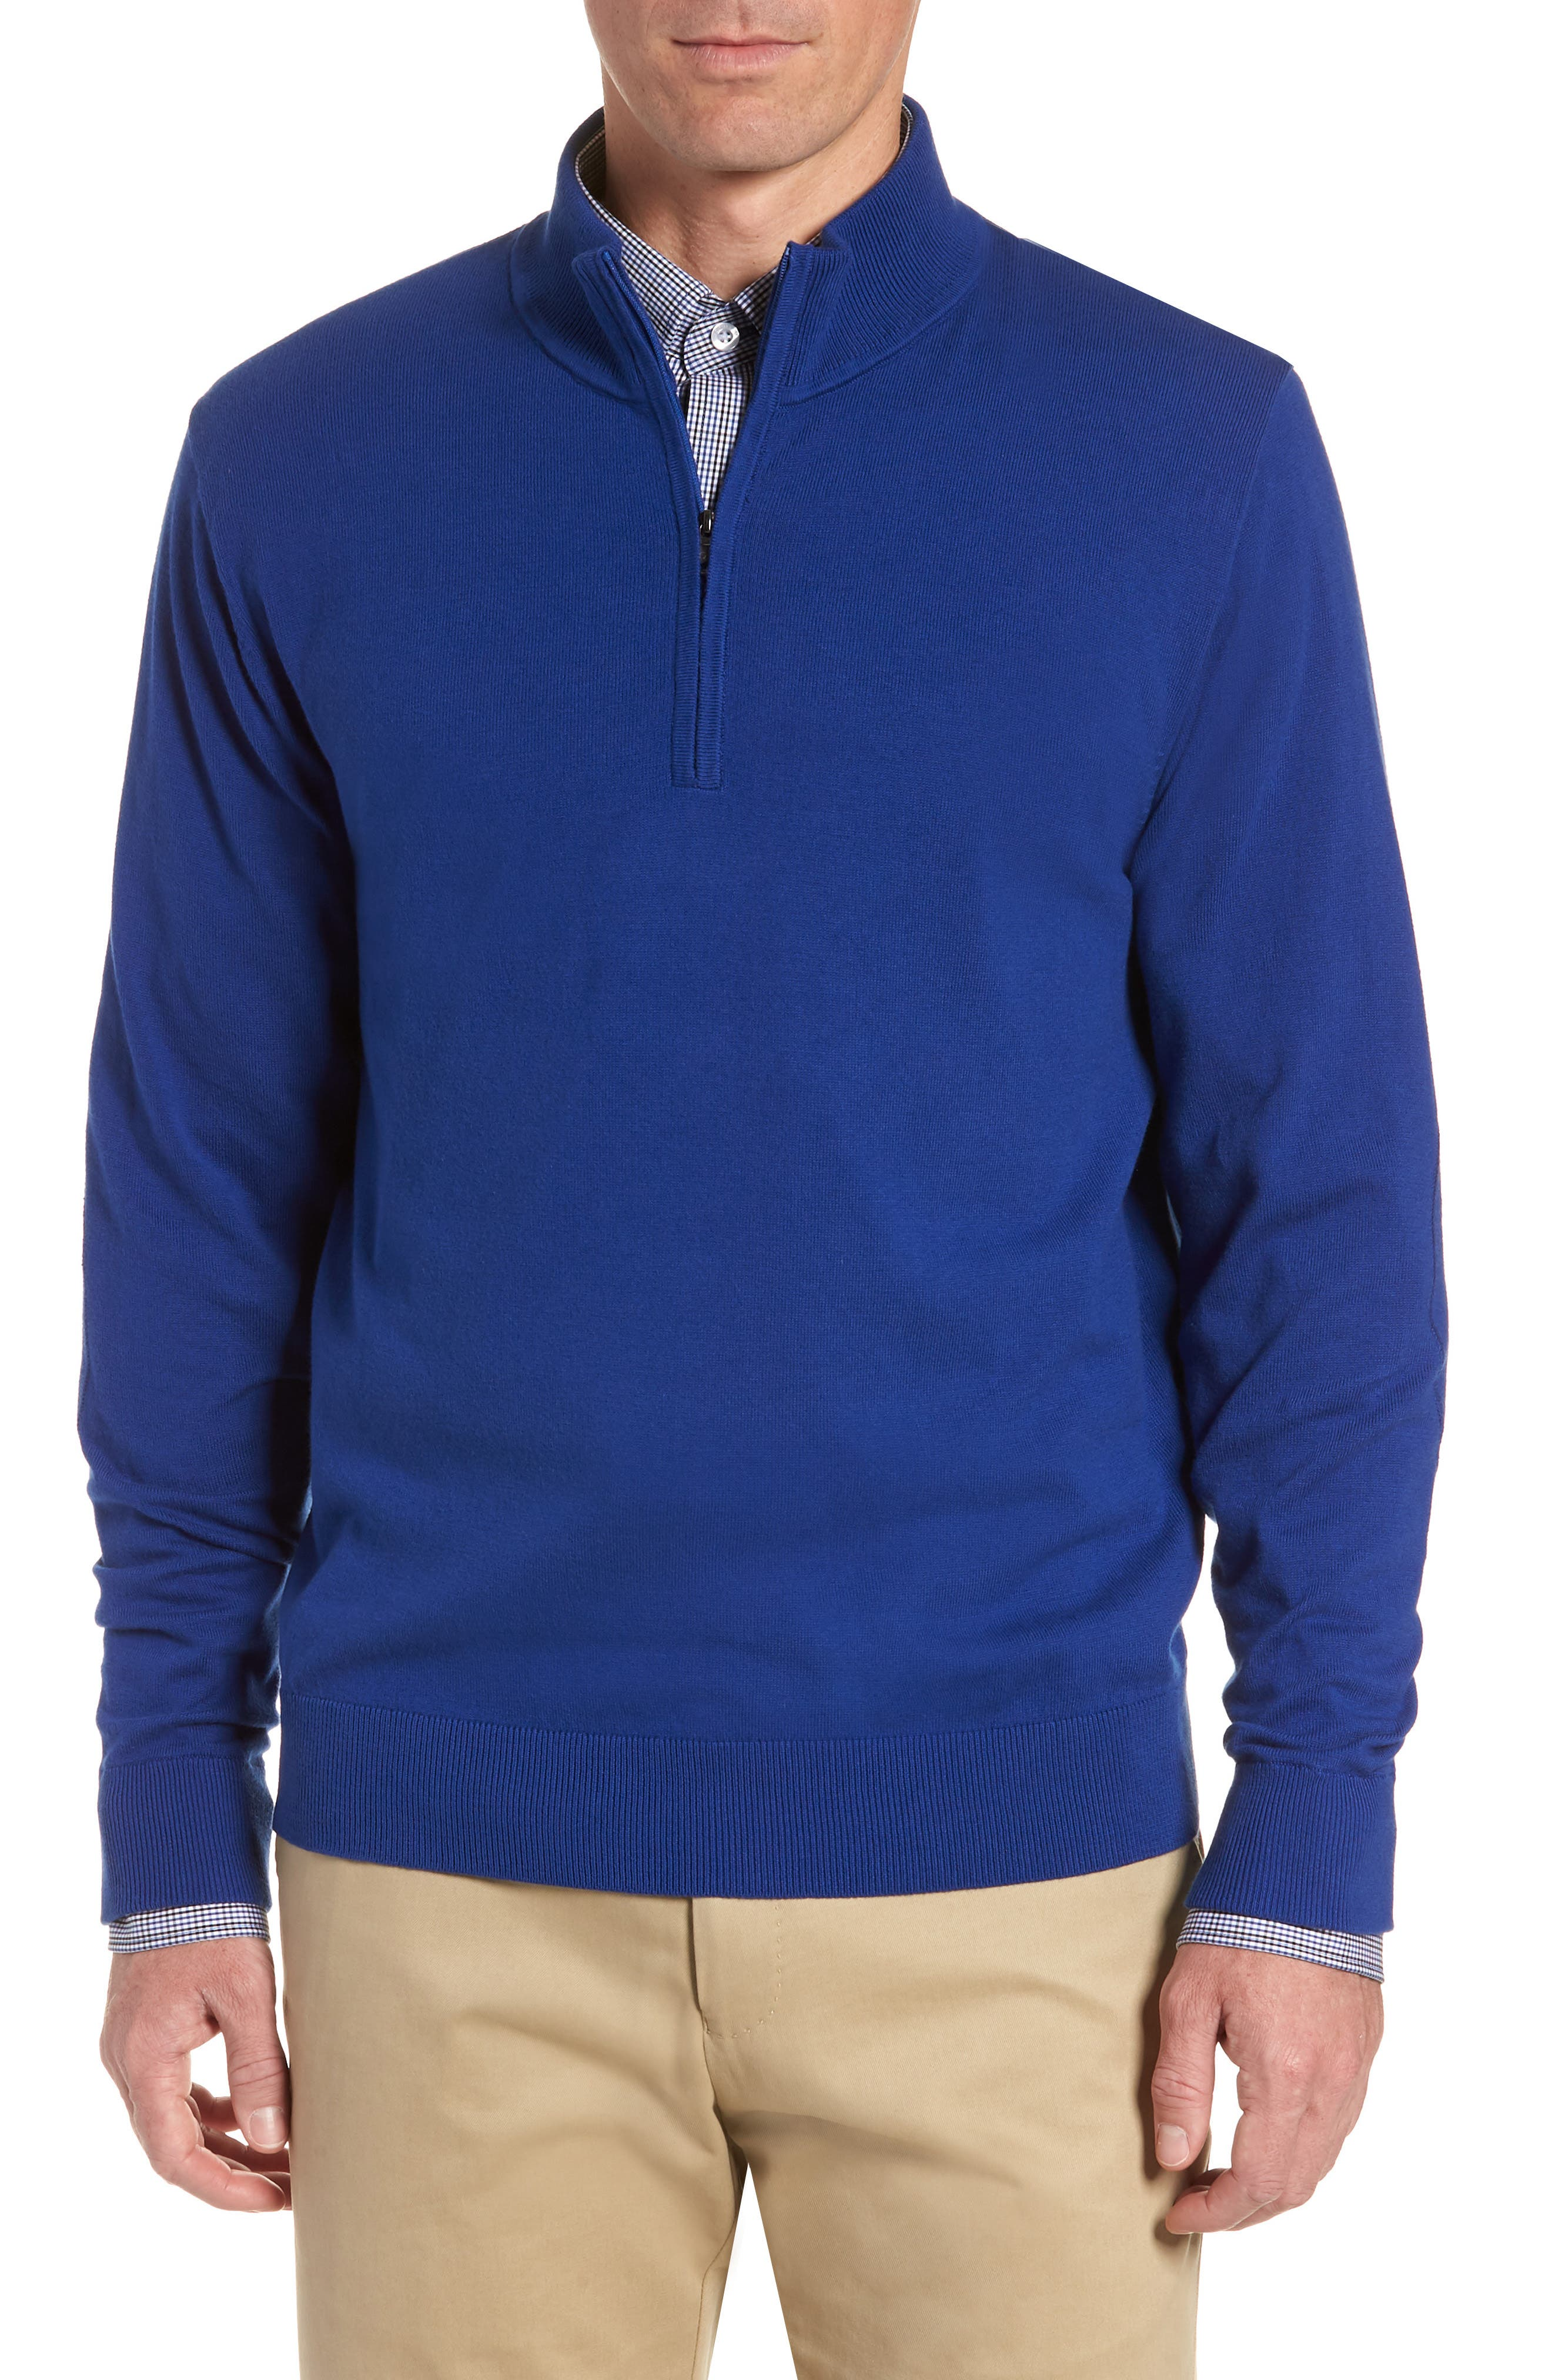 CUTTER & BUCK Lakemont Half Zip Sweater, Main, color, 419